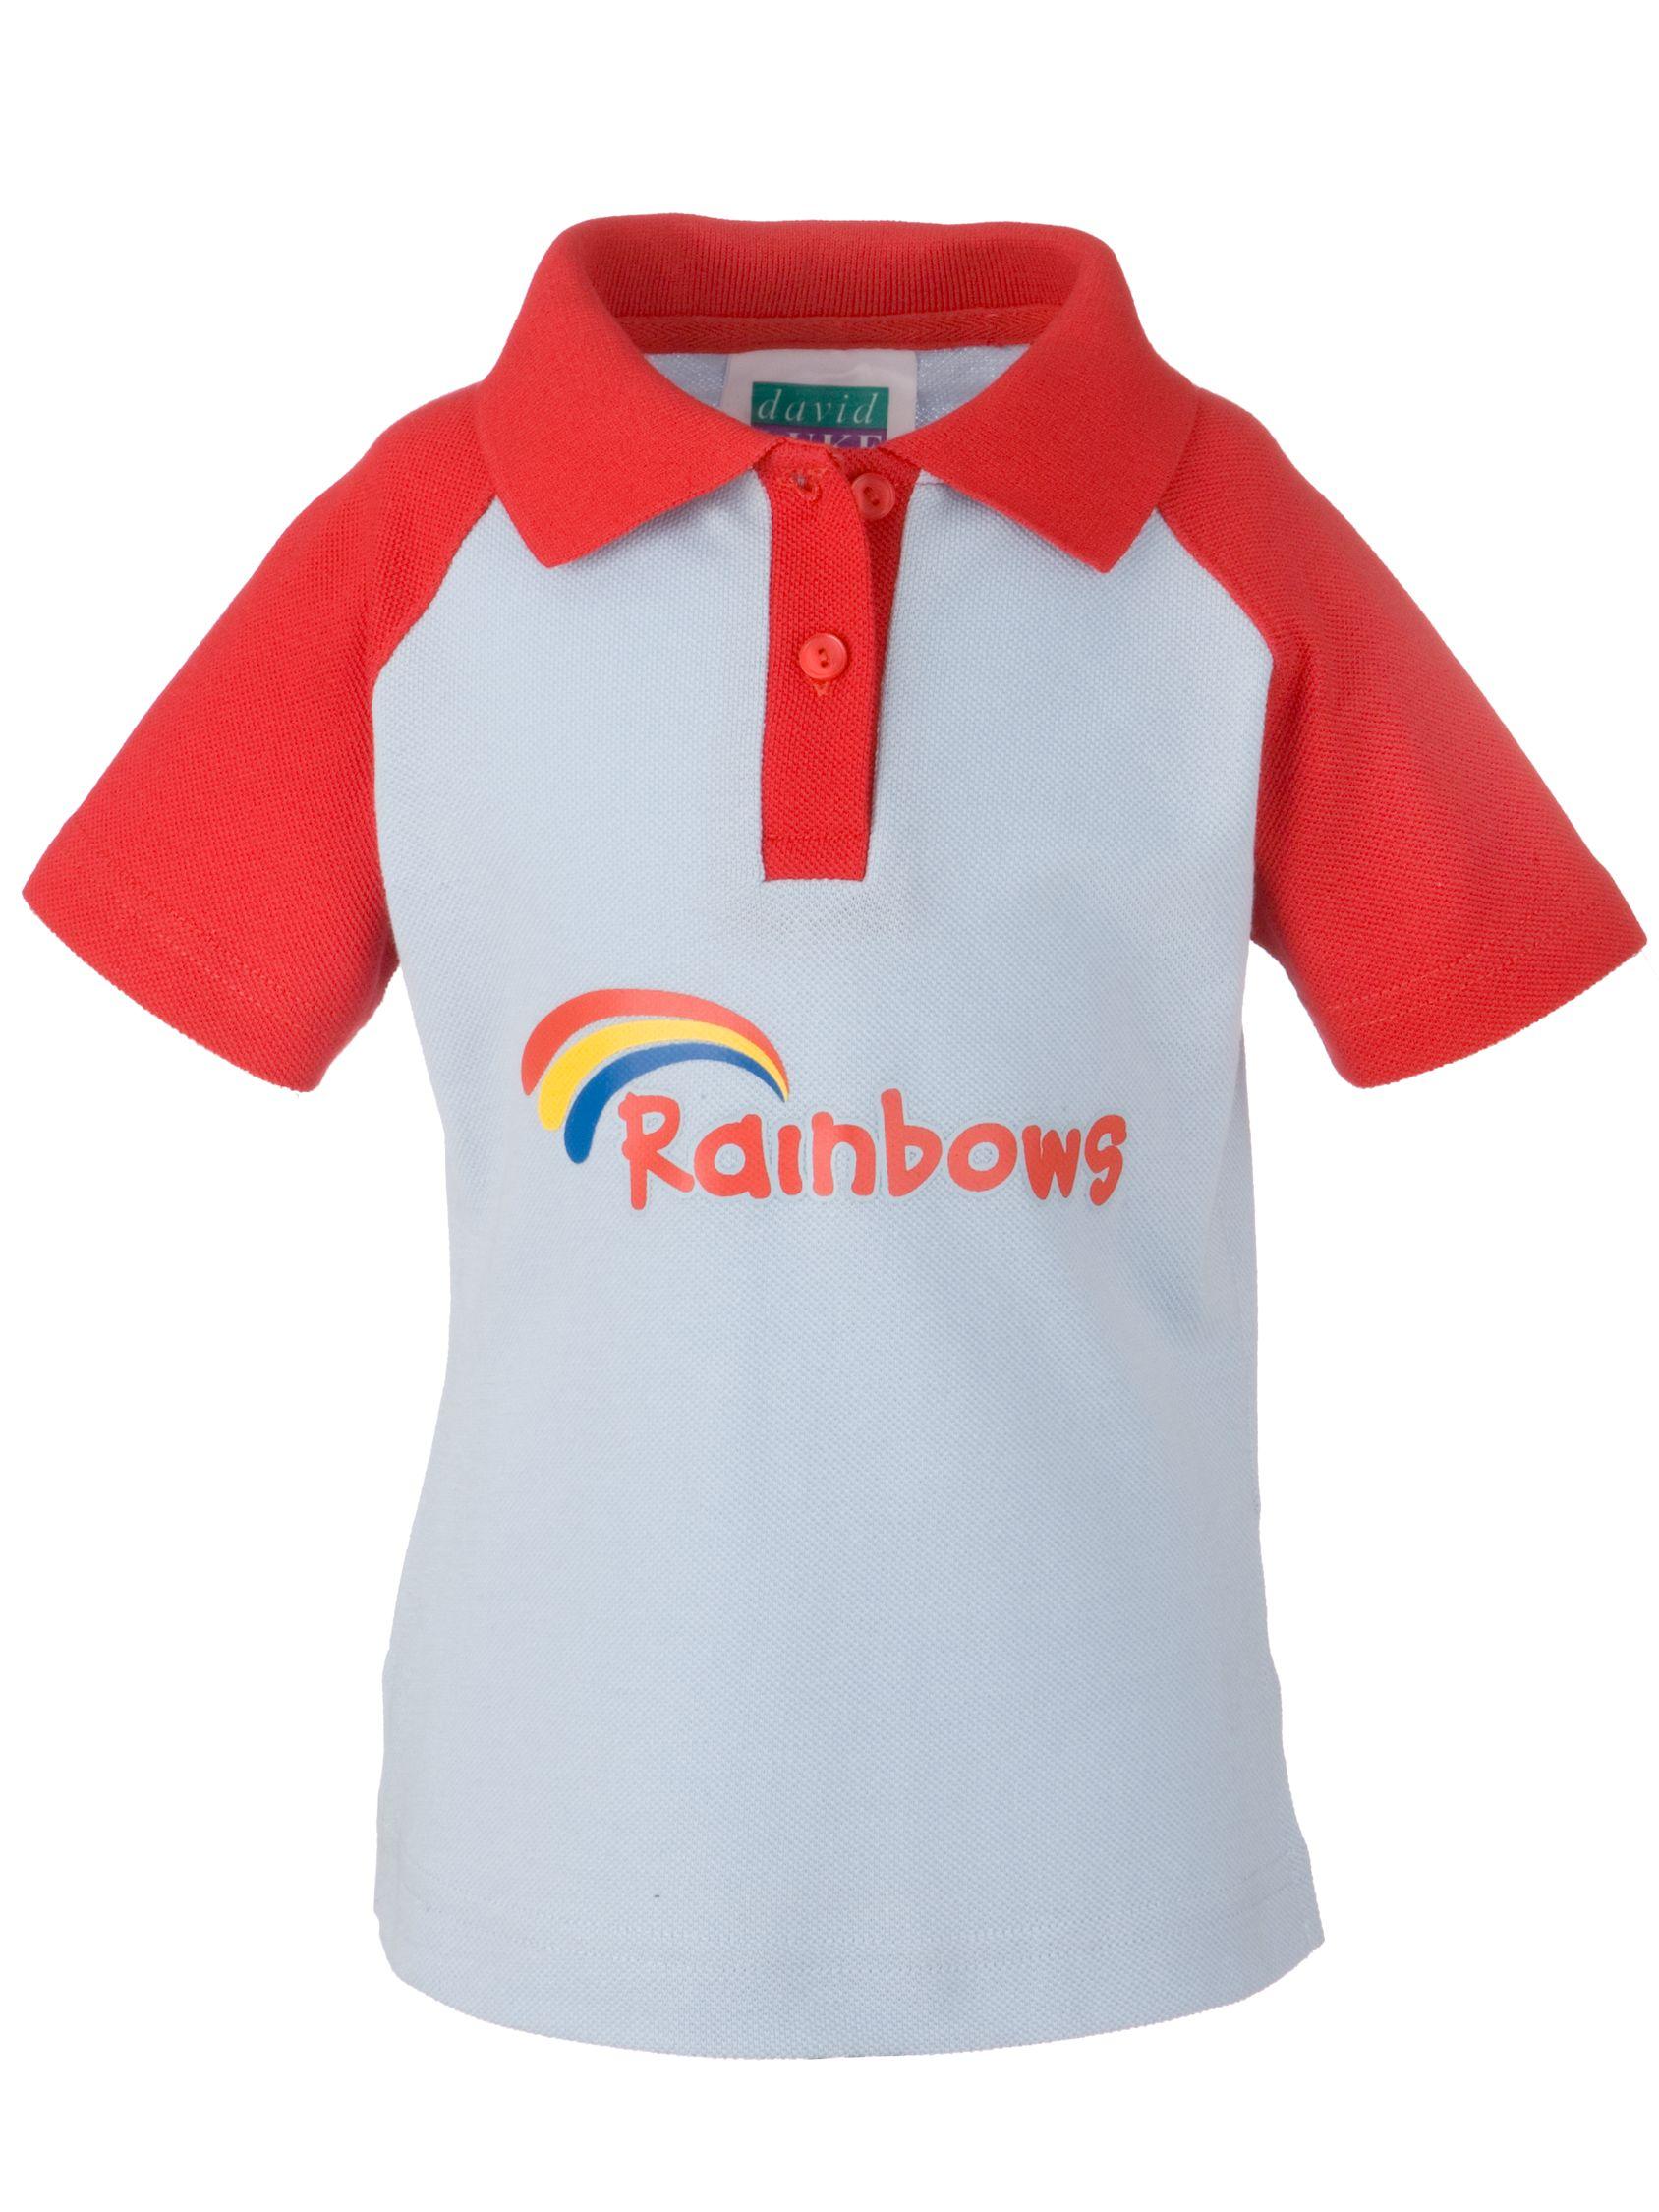 Rainbows Rainbows Uniform Short Sleeve Polo Shirt, Red